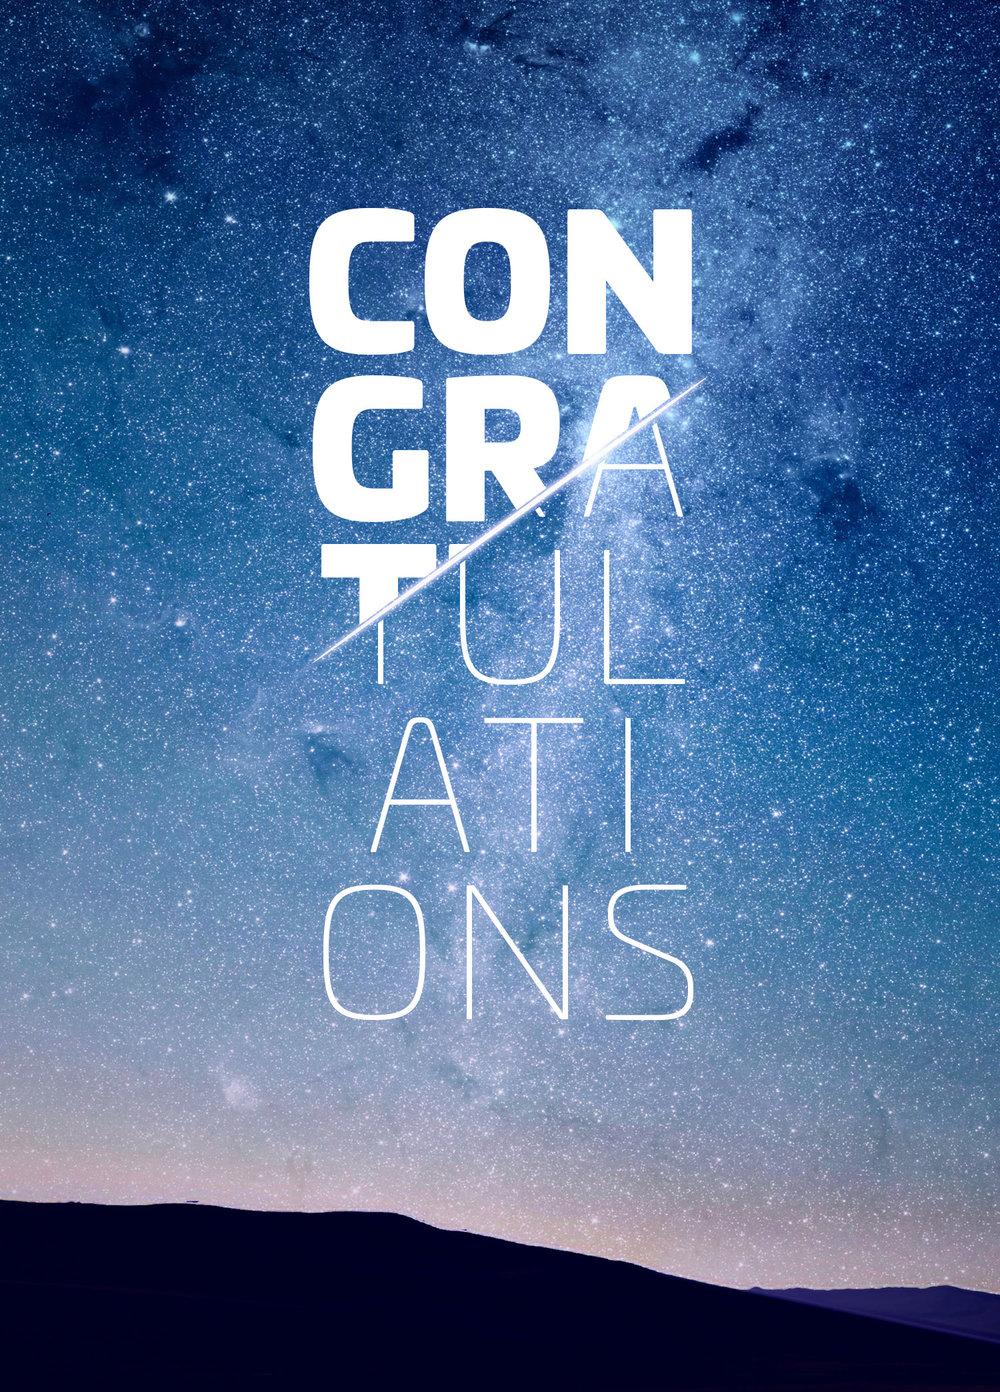 Branded Congratulations Image